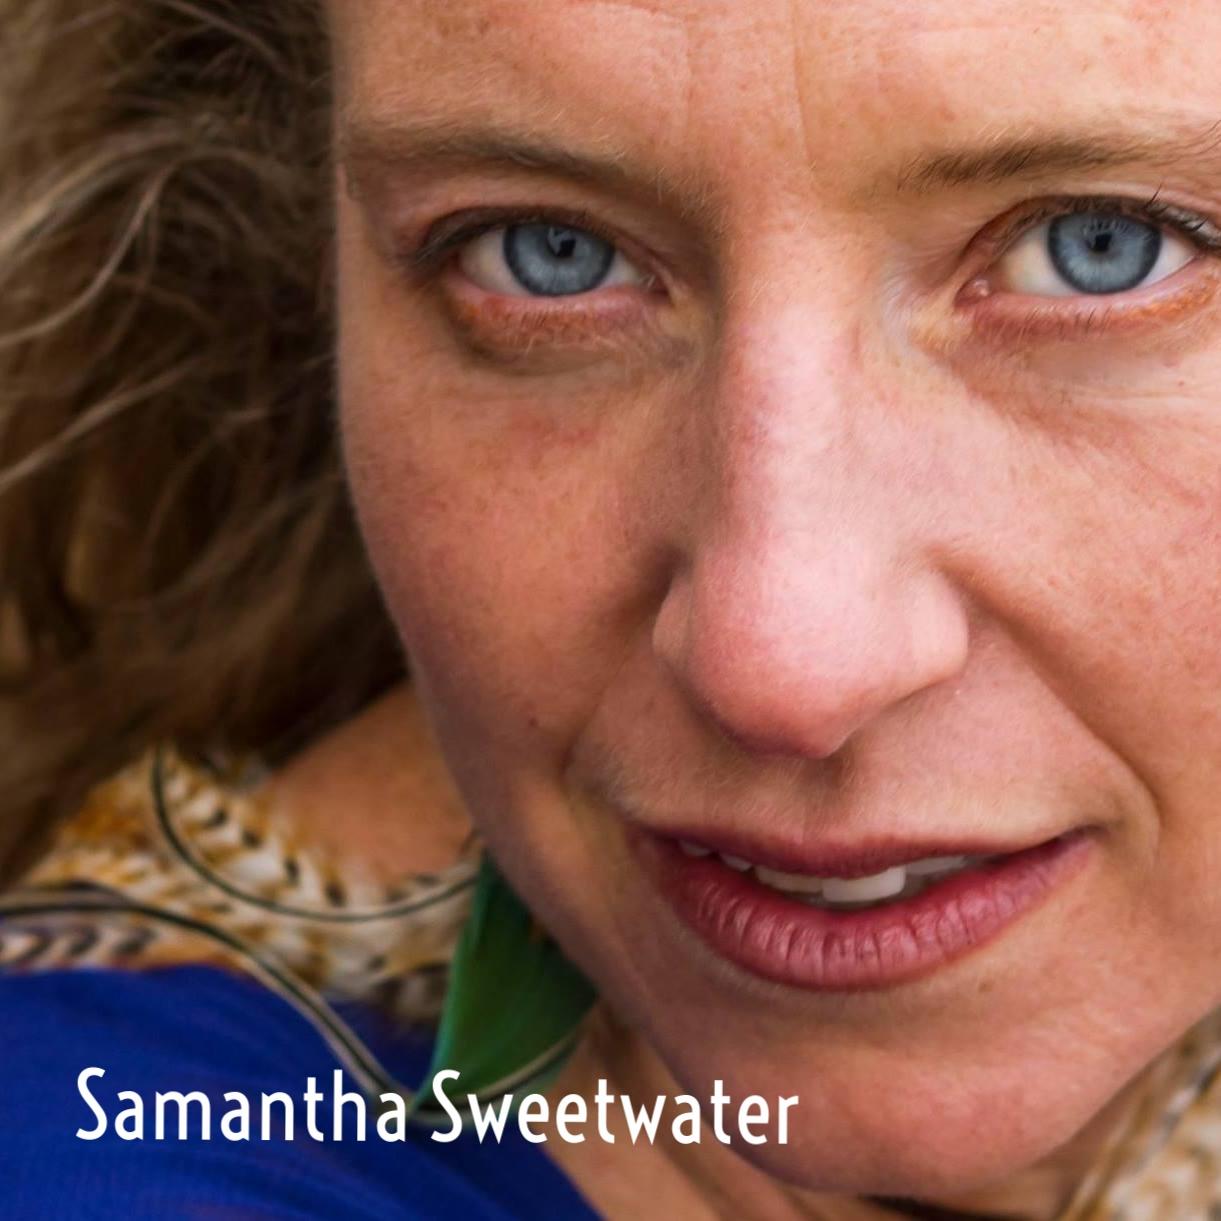 Samantha Sweetwater